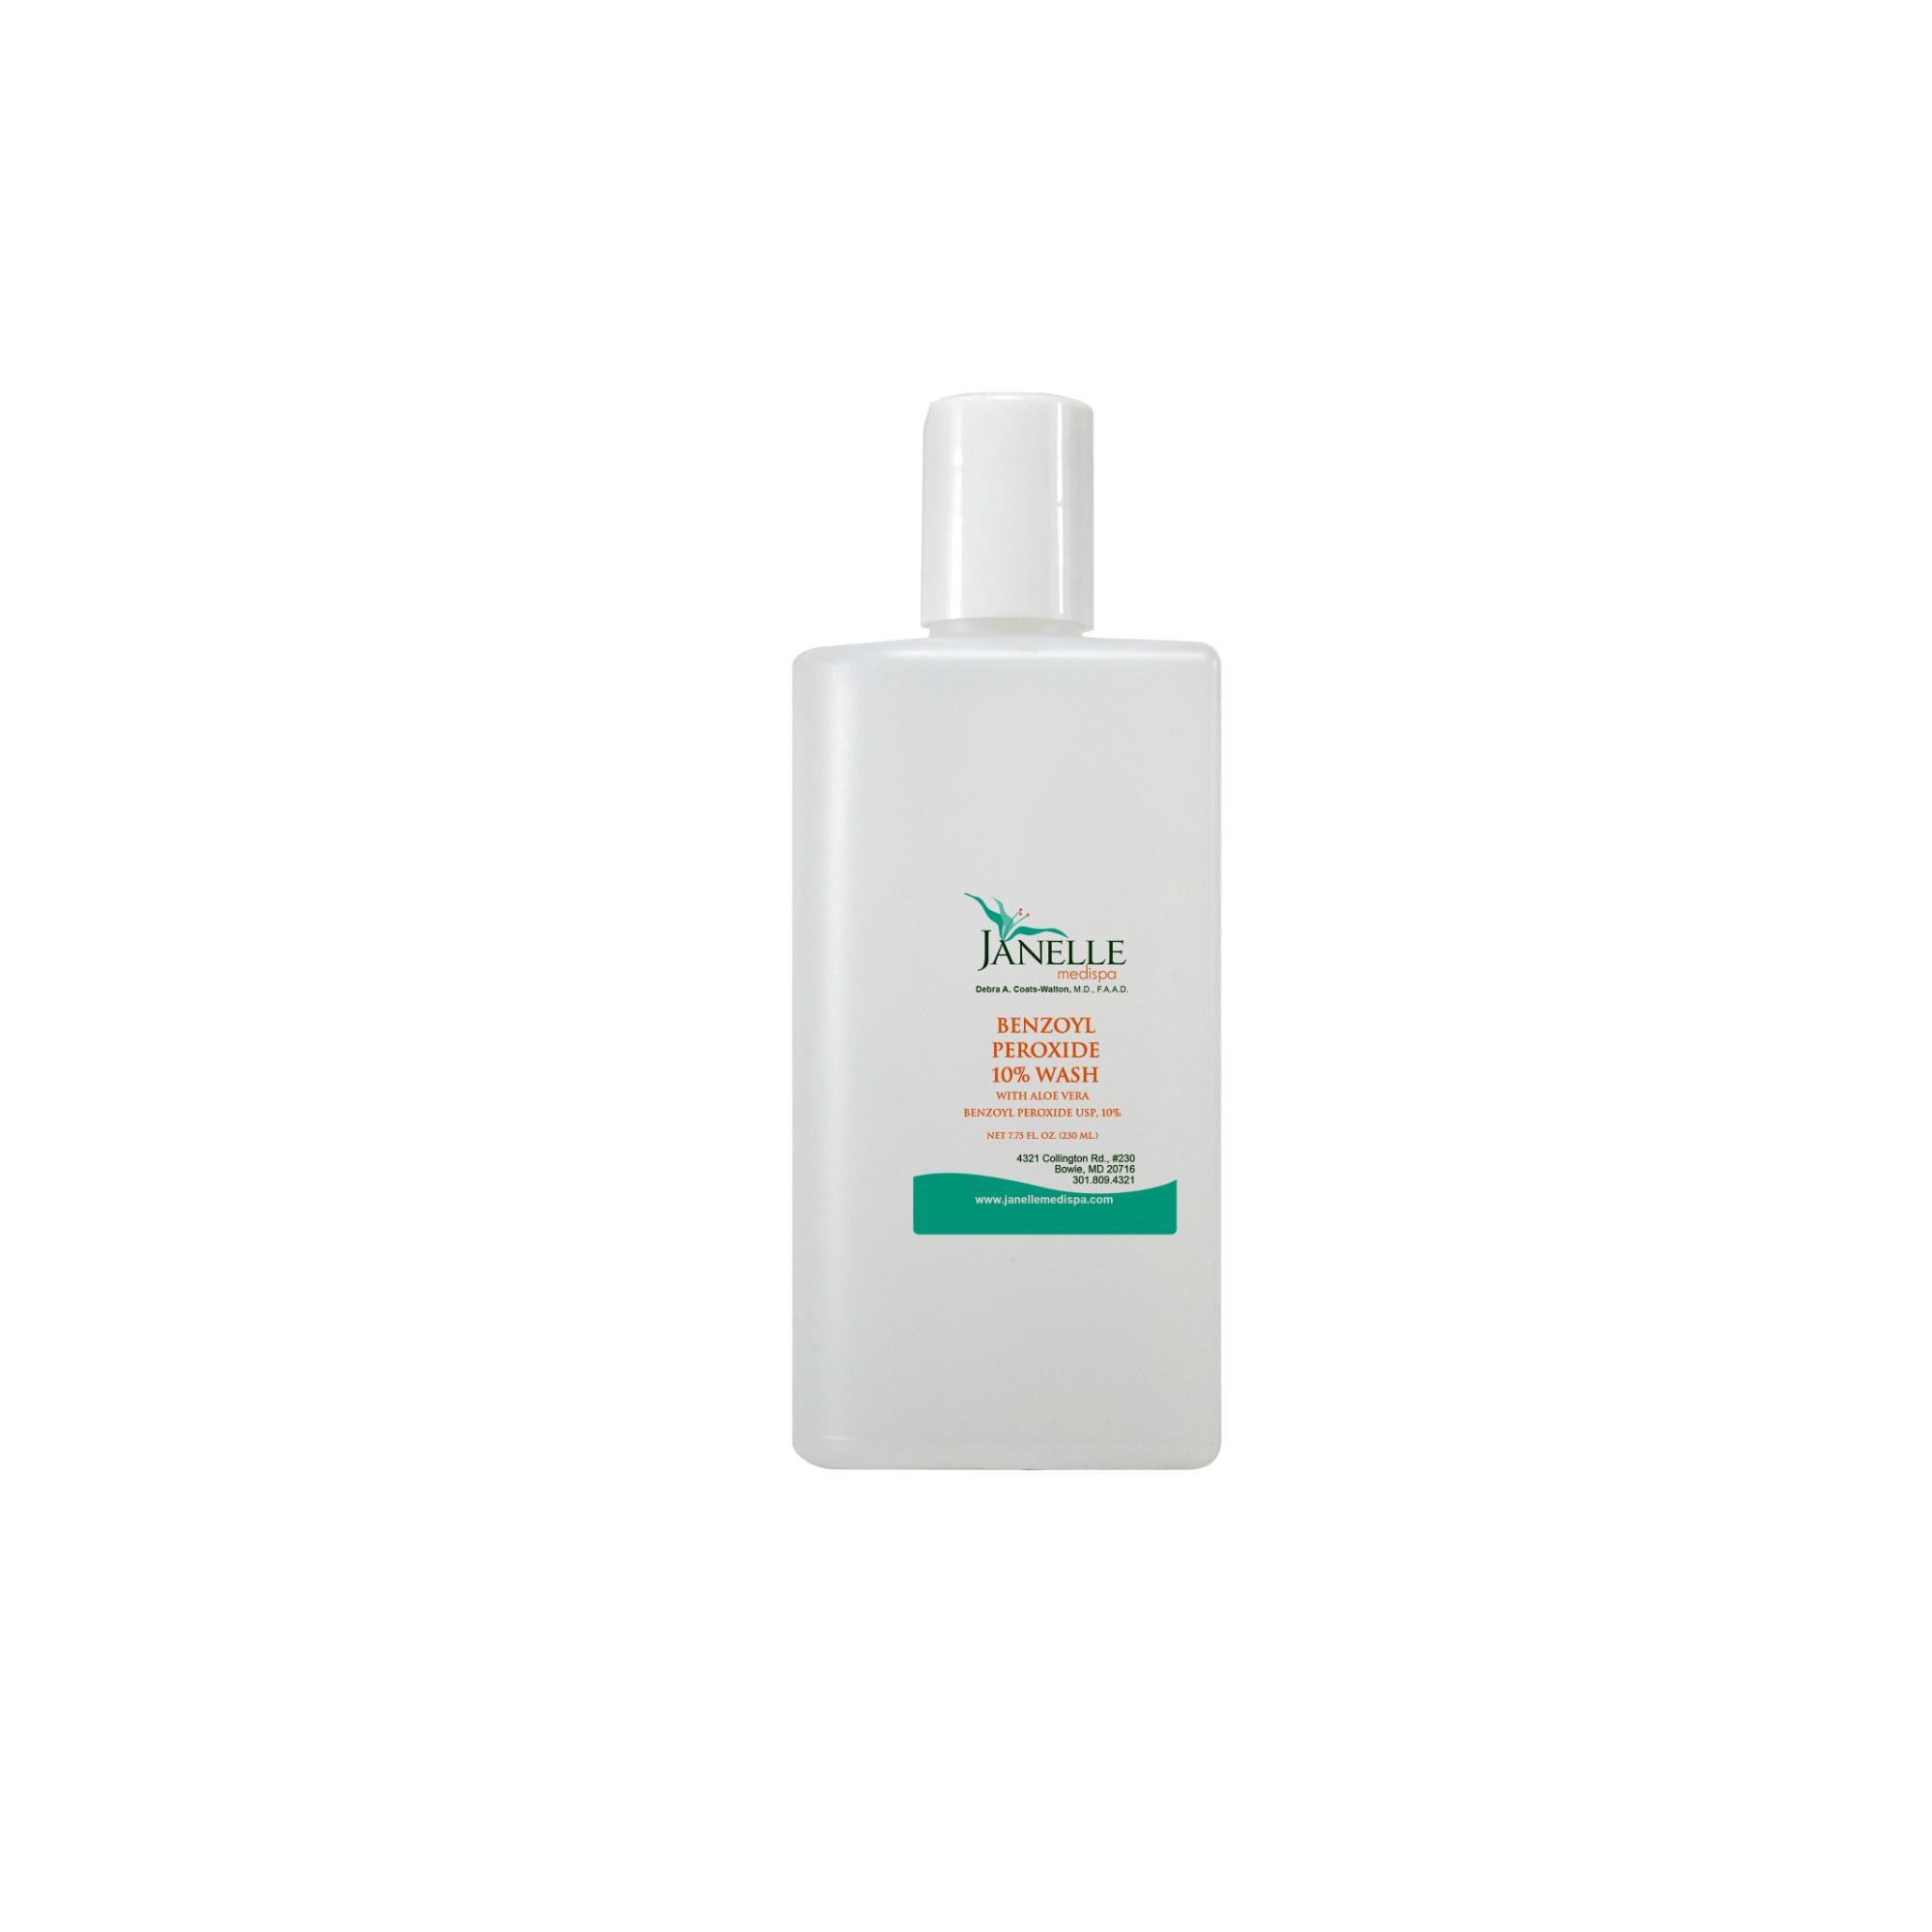 Benzoyl Peroxide 10 wash